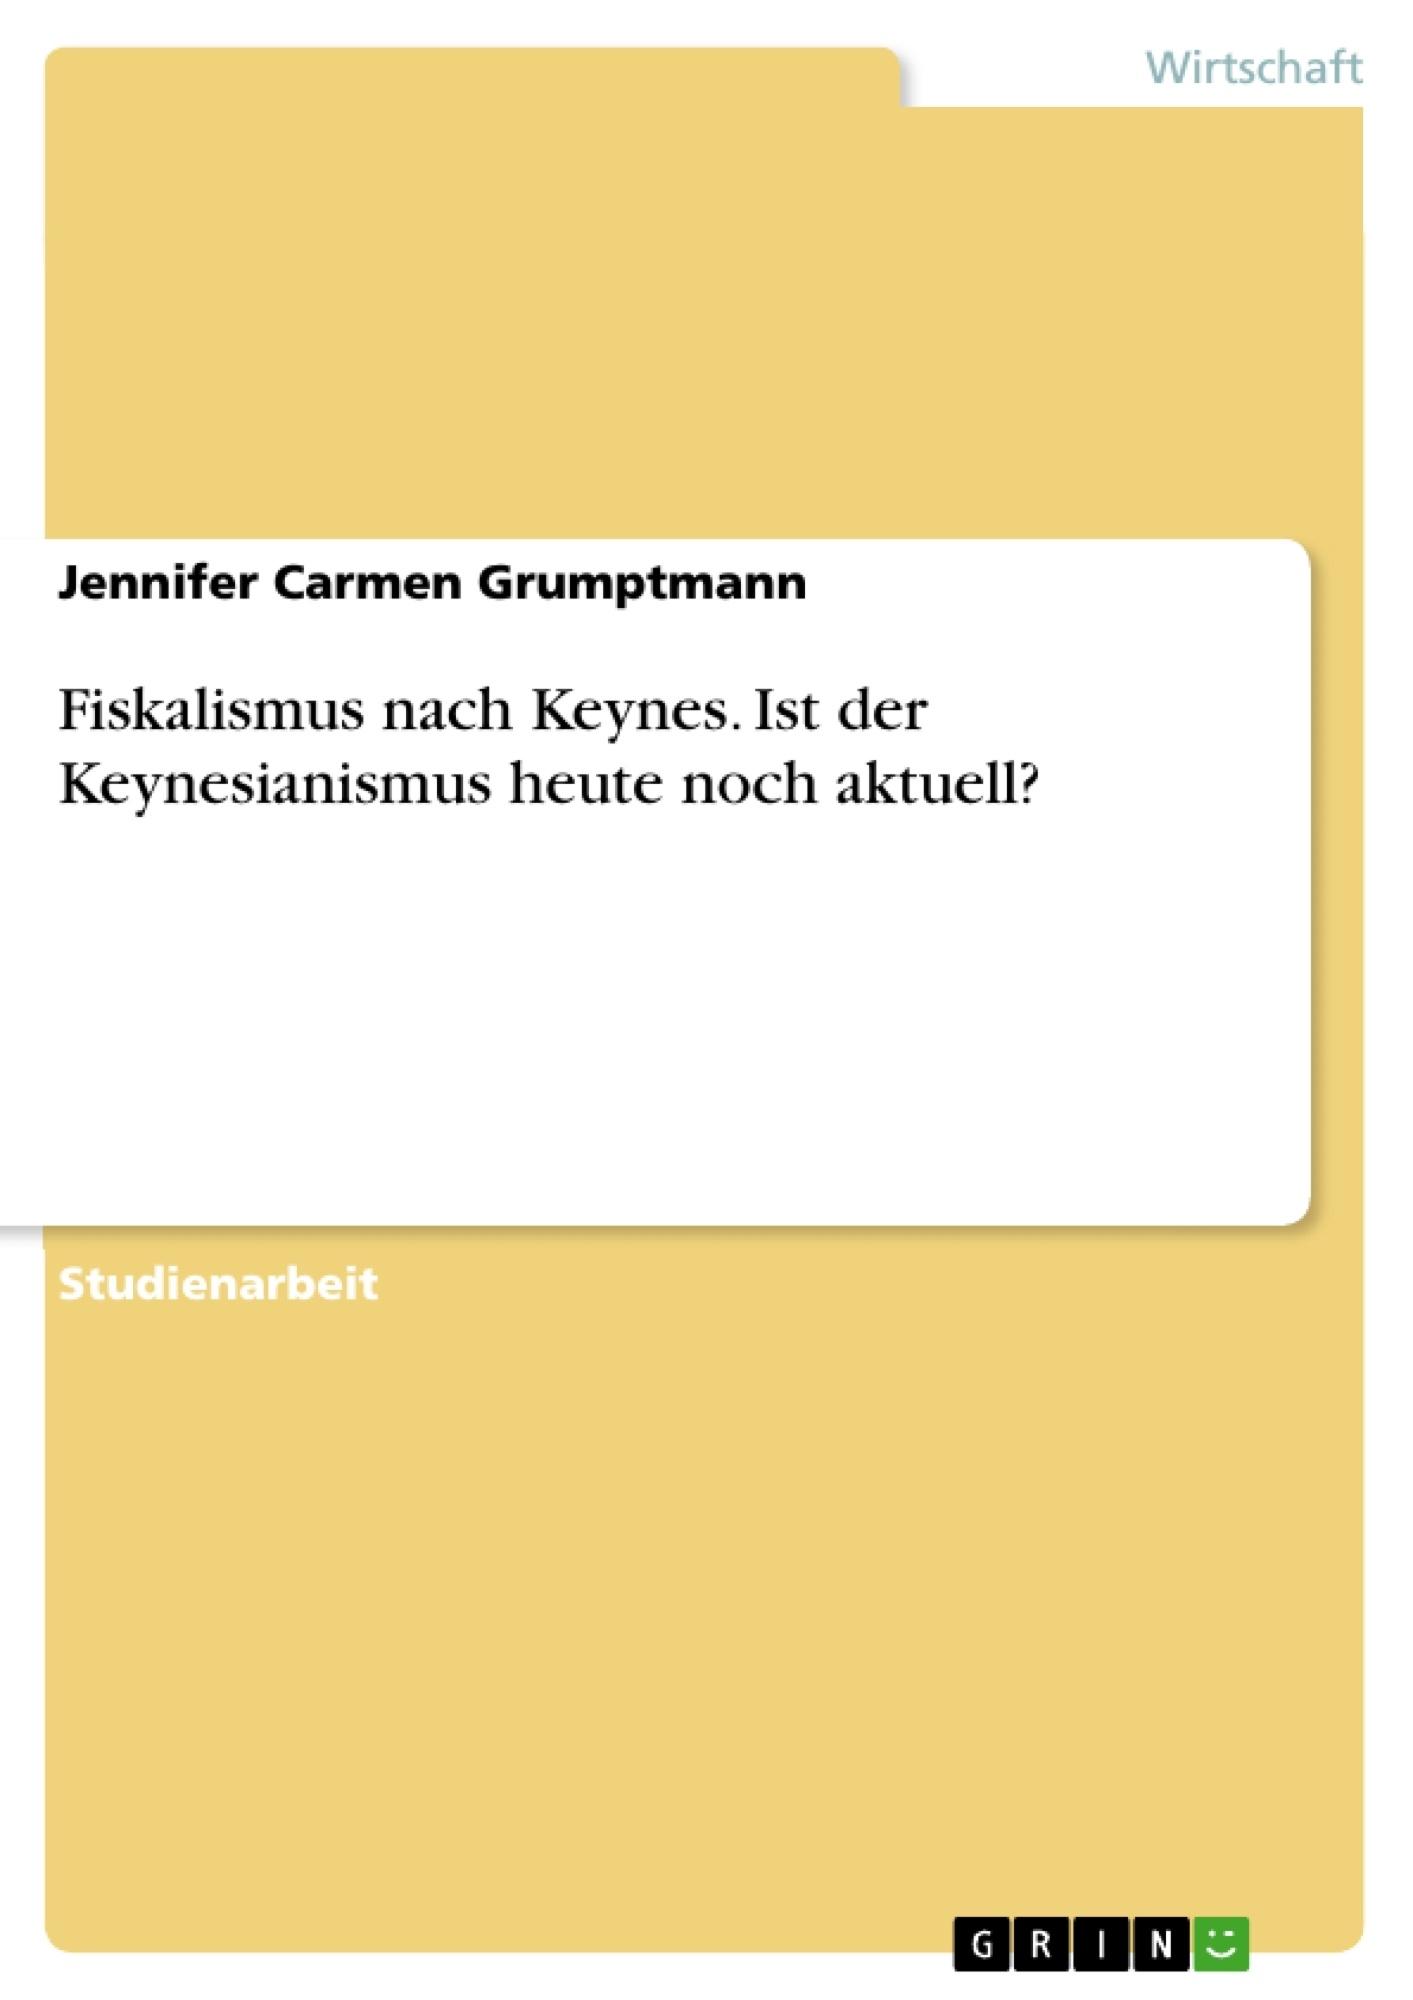 Titel: Fiskalismus nach Keynes. Ist der Keynesianismus heute noch aktuell?